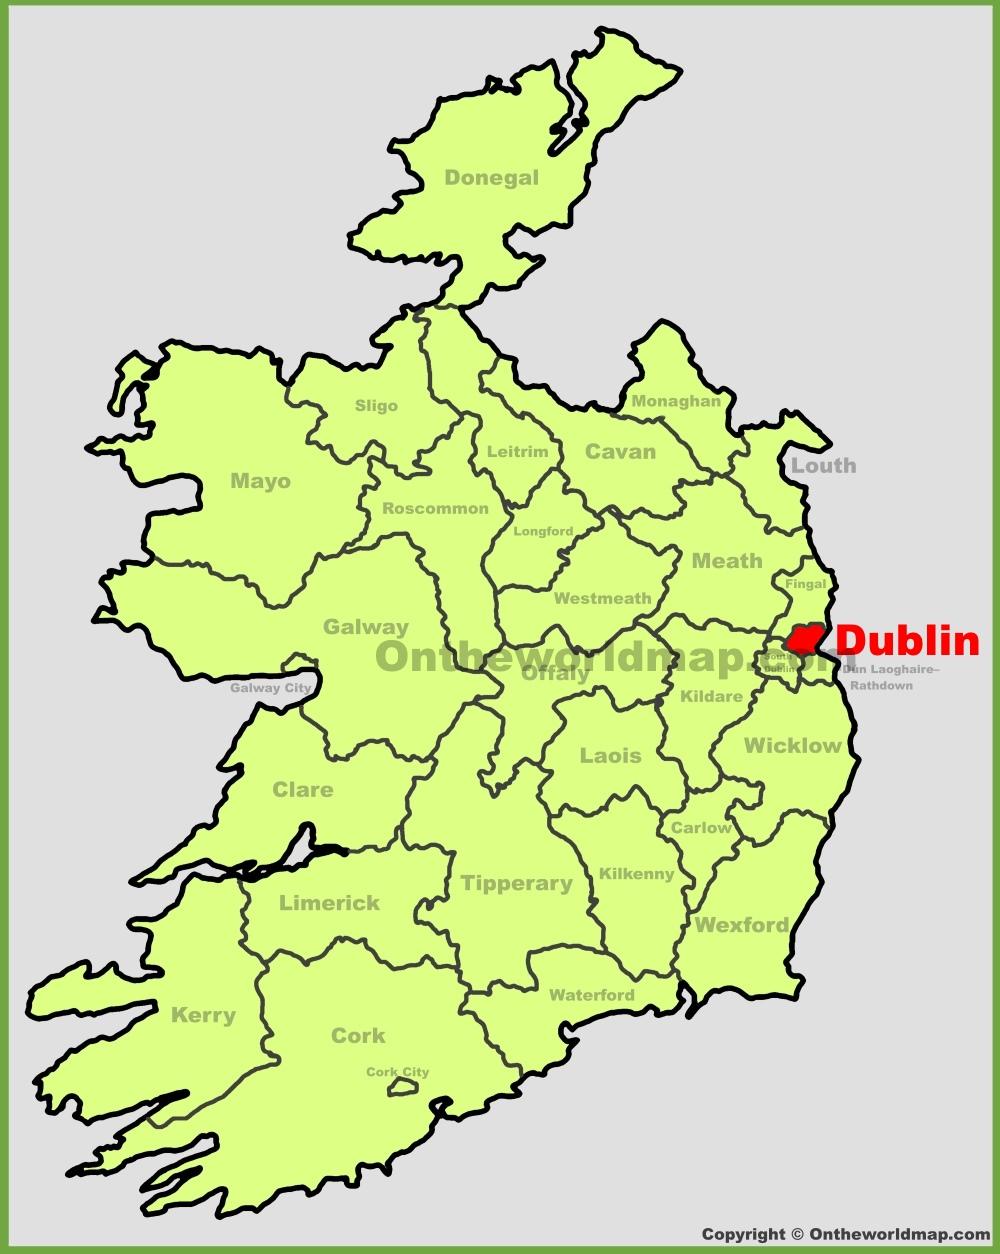 Dublin Ireland Map Dublin location on the Ireland map